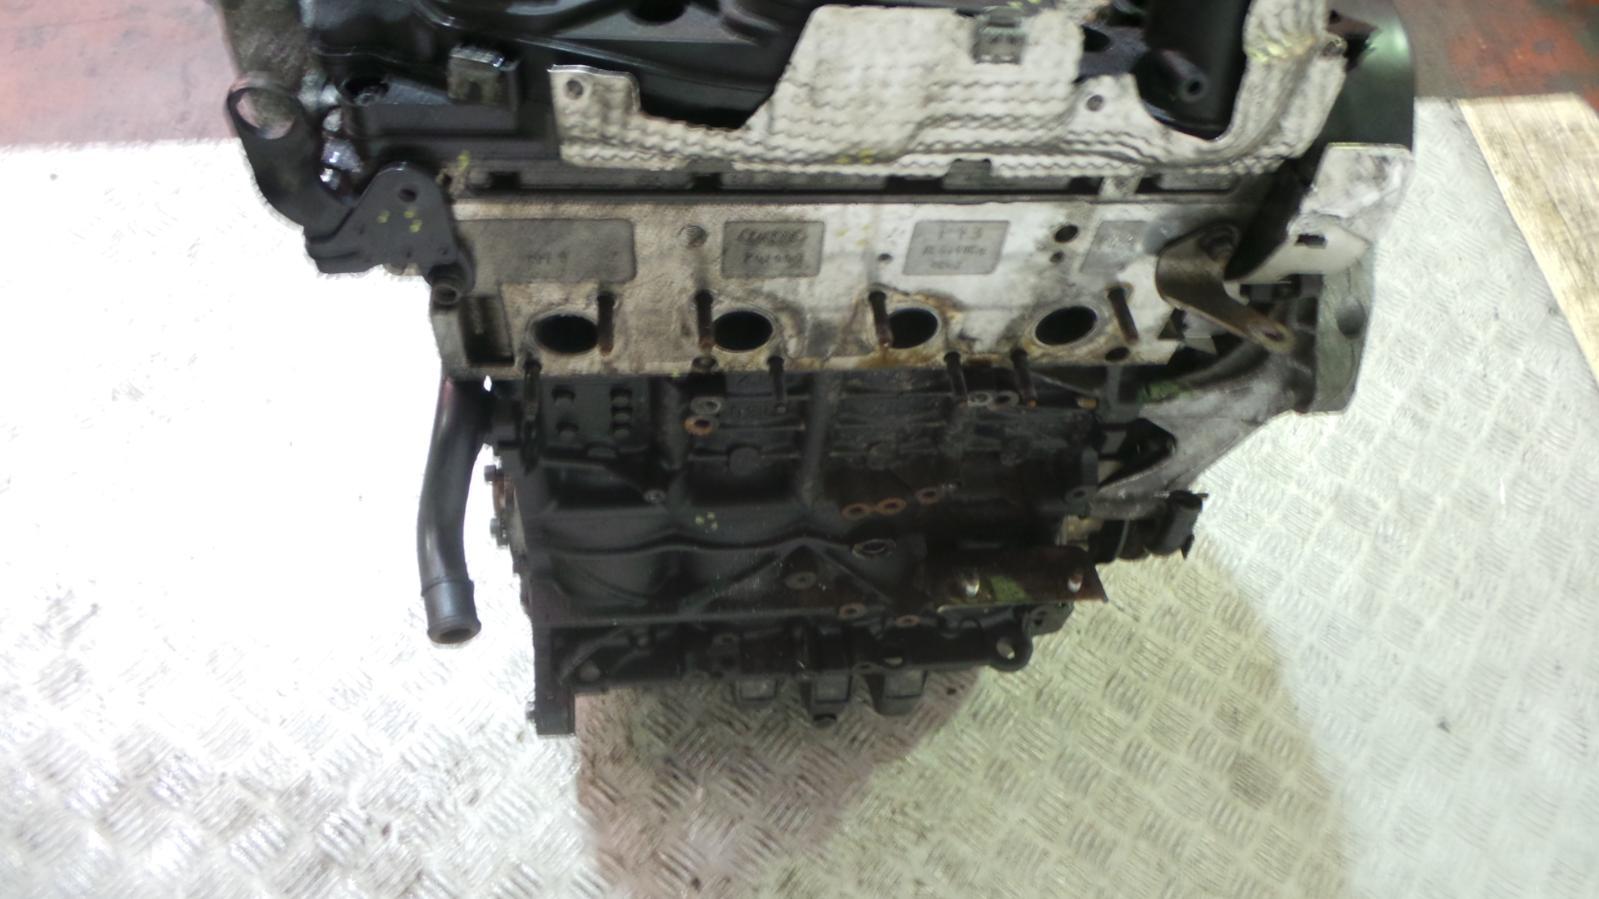 2009 Vw Passat B6 2 0 Tdi Diesel Cbab Engine With